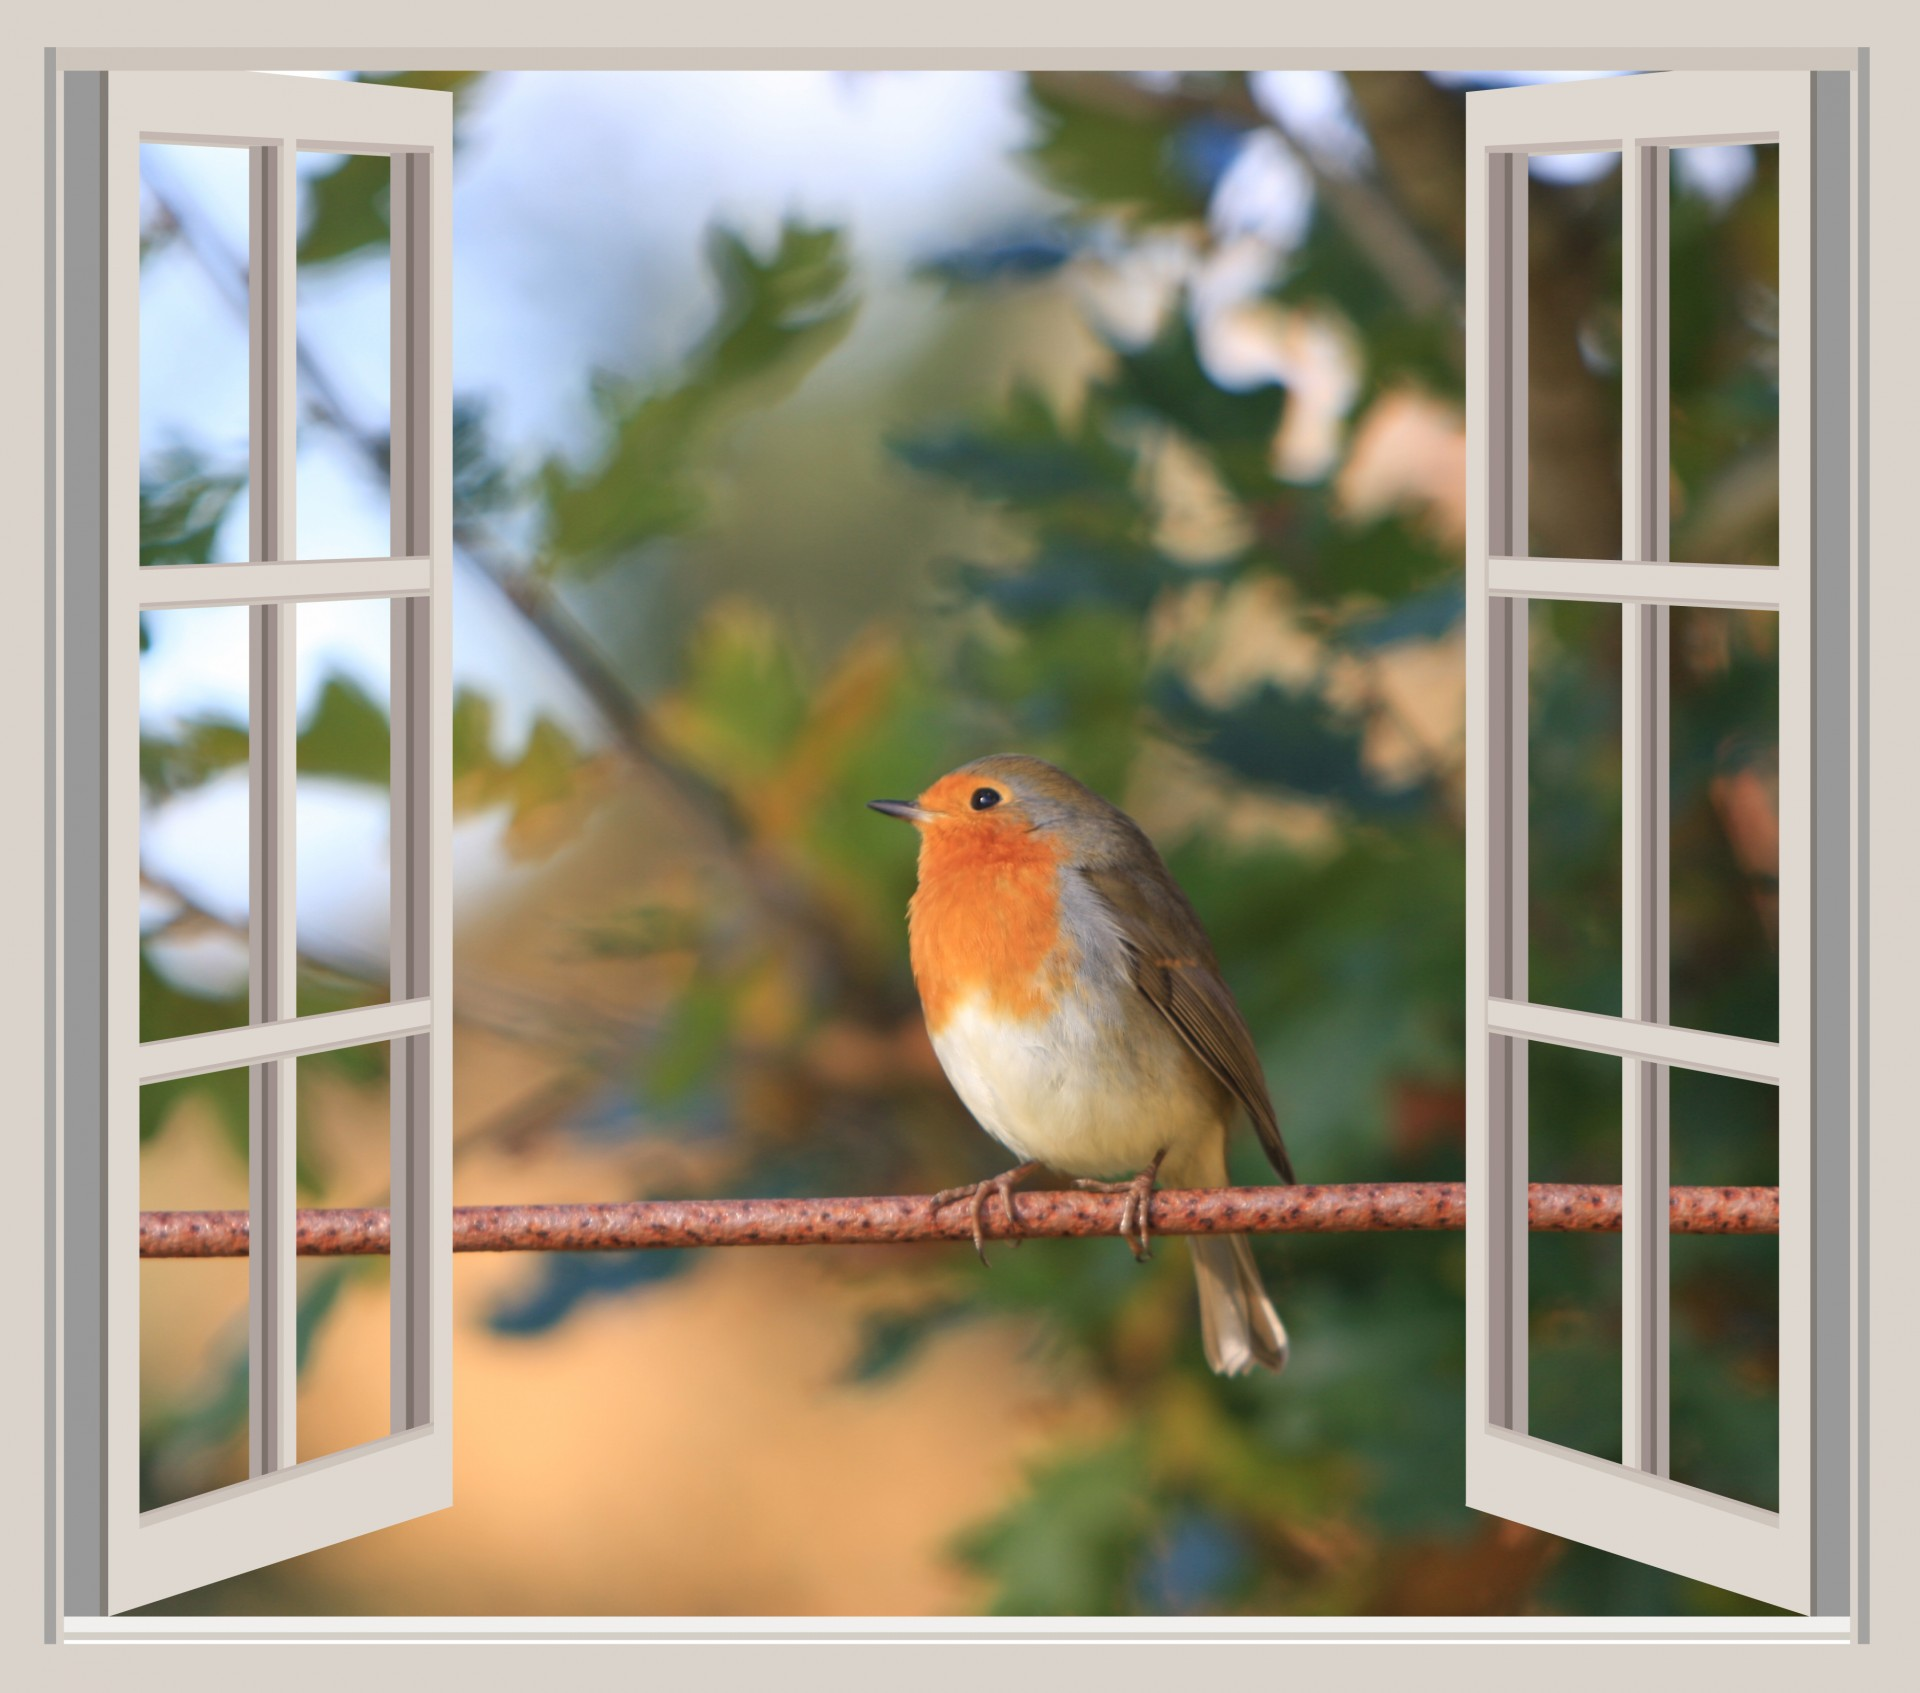 Bird Robin Window Frame Open Free Image From Needpix Com